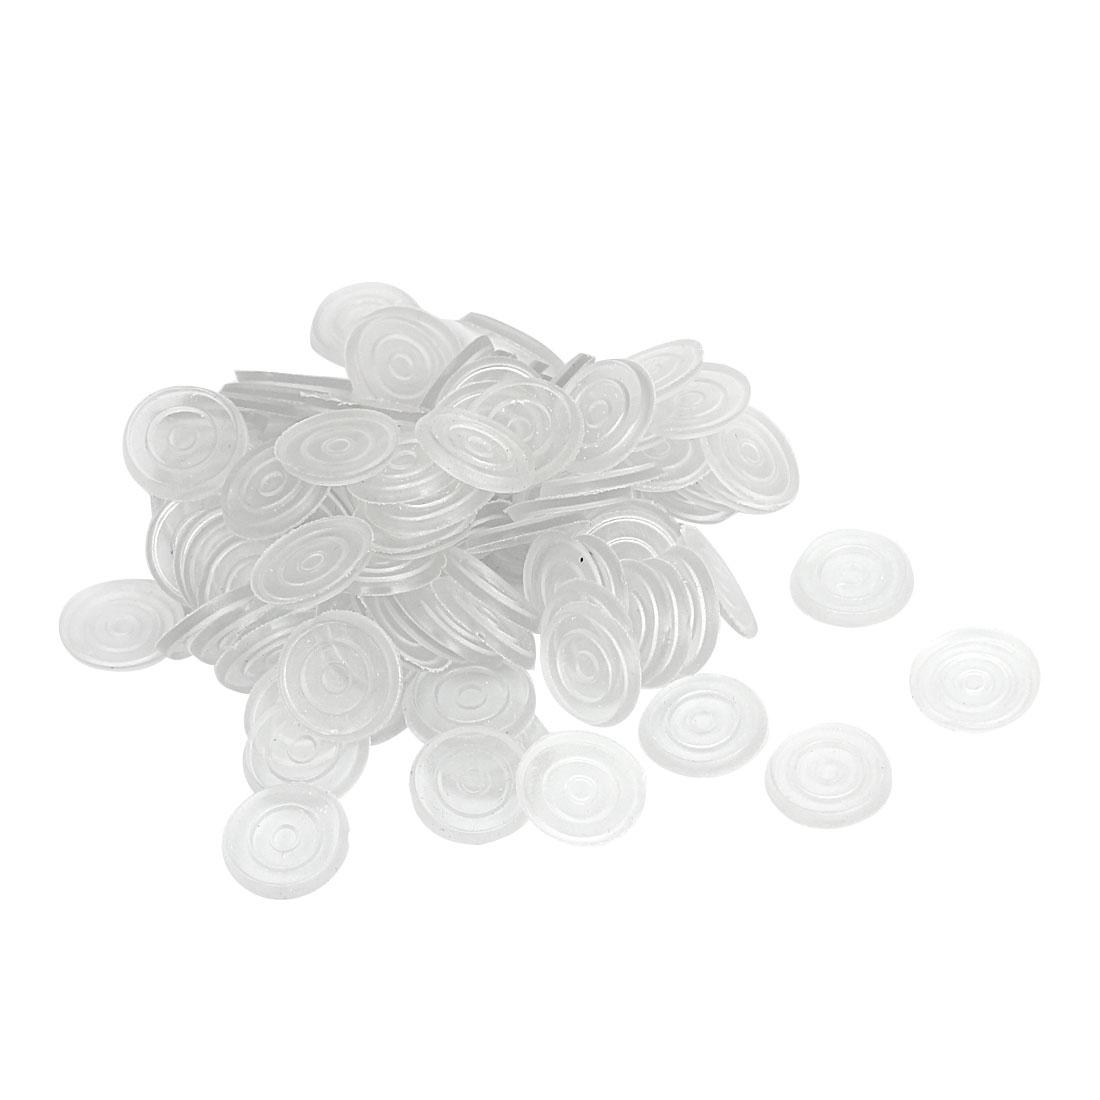 18mm Dia Round Clear Plastic Non-slip Glass Table Dash Mat Pad Cushion 100Pcs